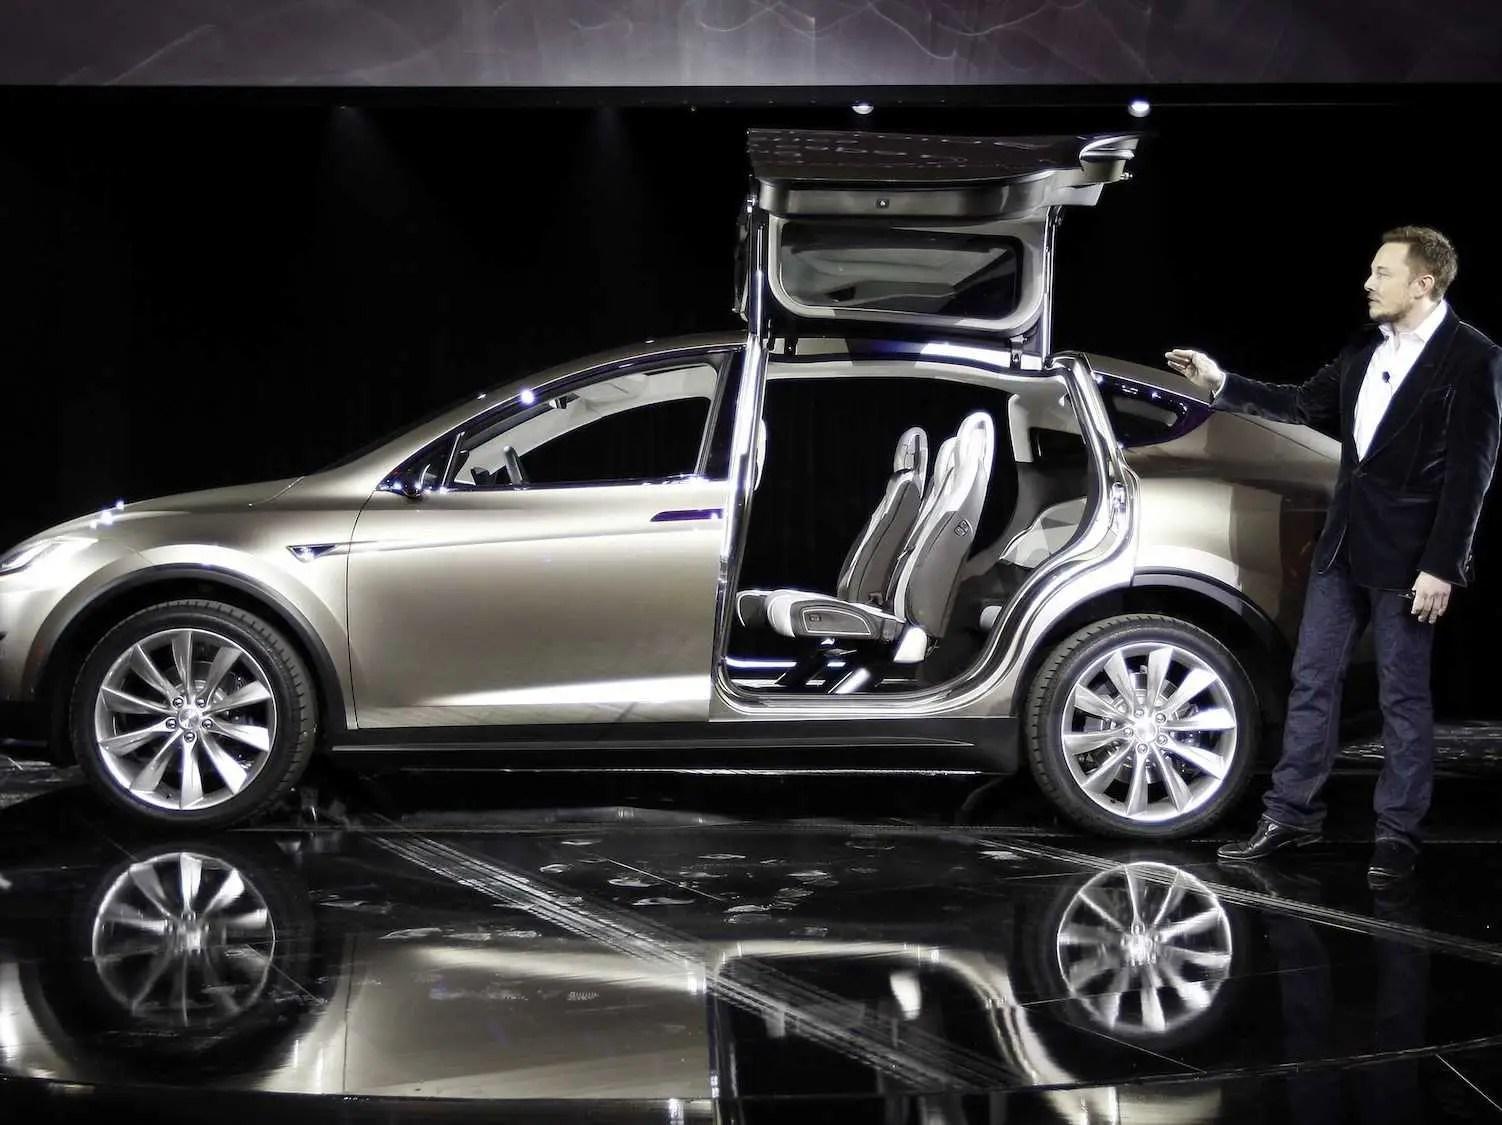 https://i1.wp.com/static5.businessinsider.com/image/530610acecad049d0316d24c/elon-musk-teslas-suv-will-be-more-popular-than-the-model-s-sedan.jpg